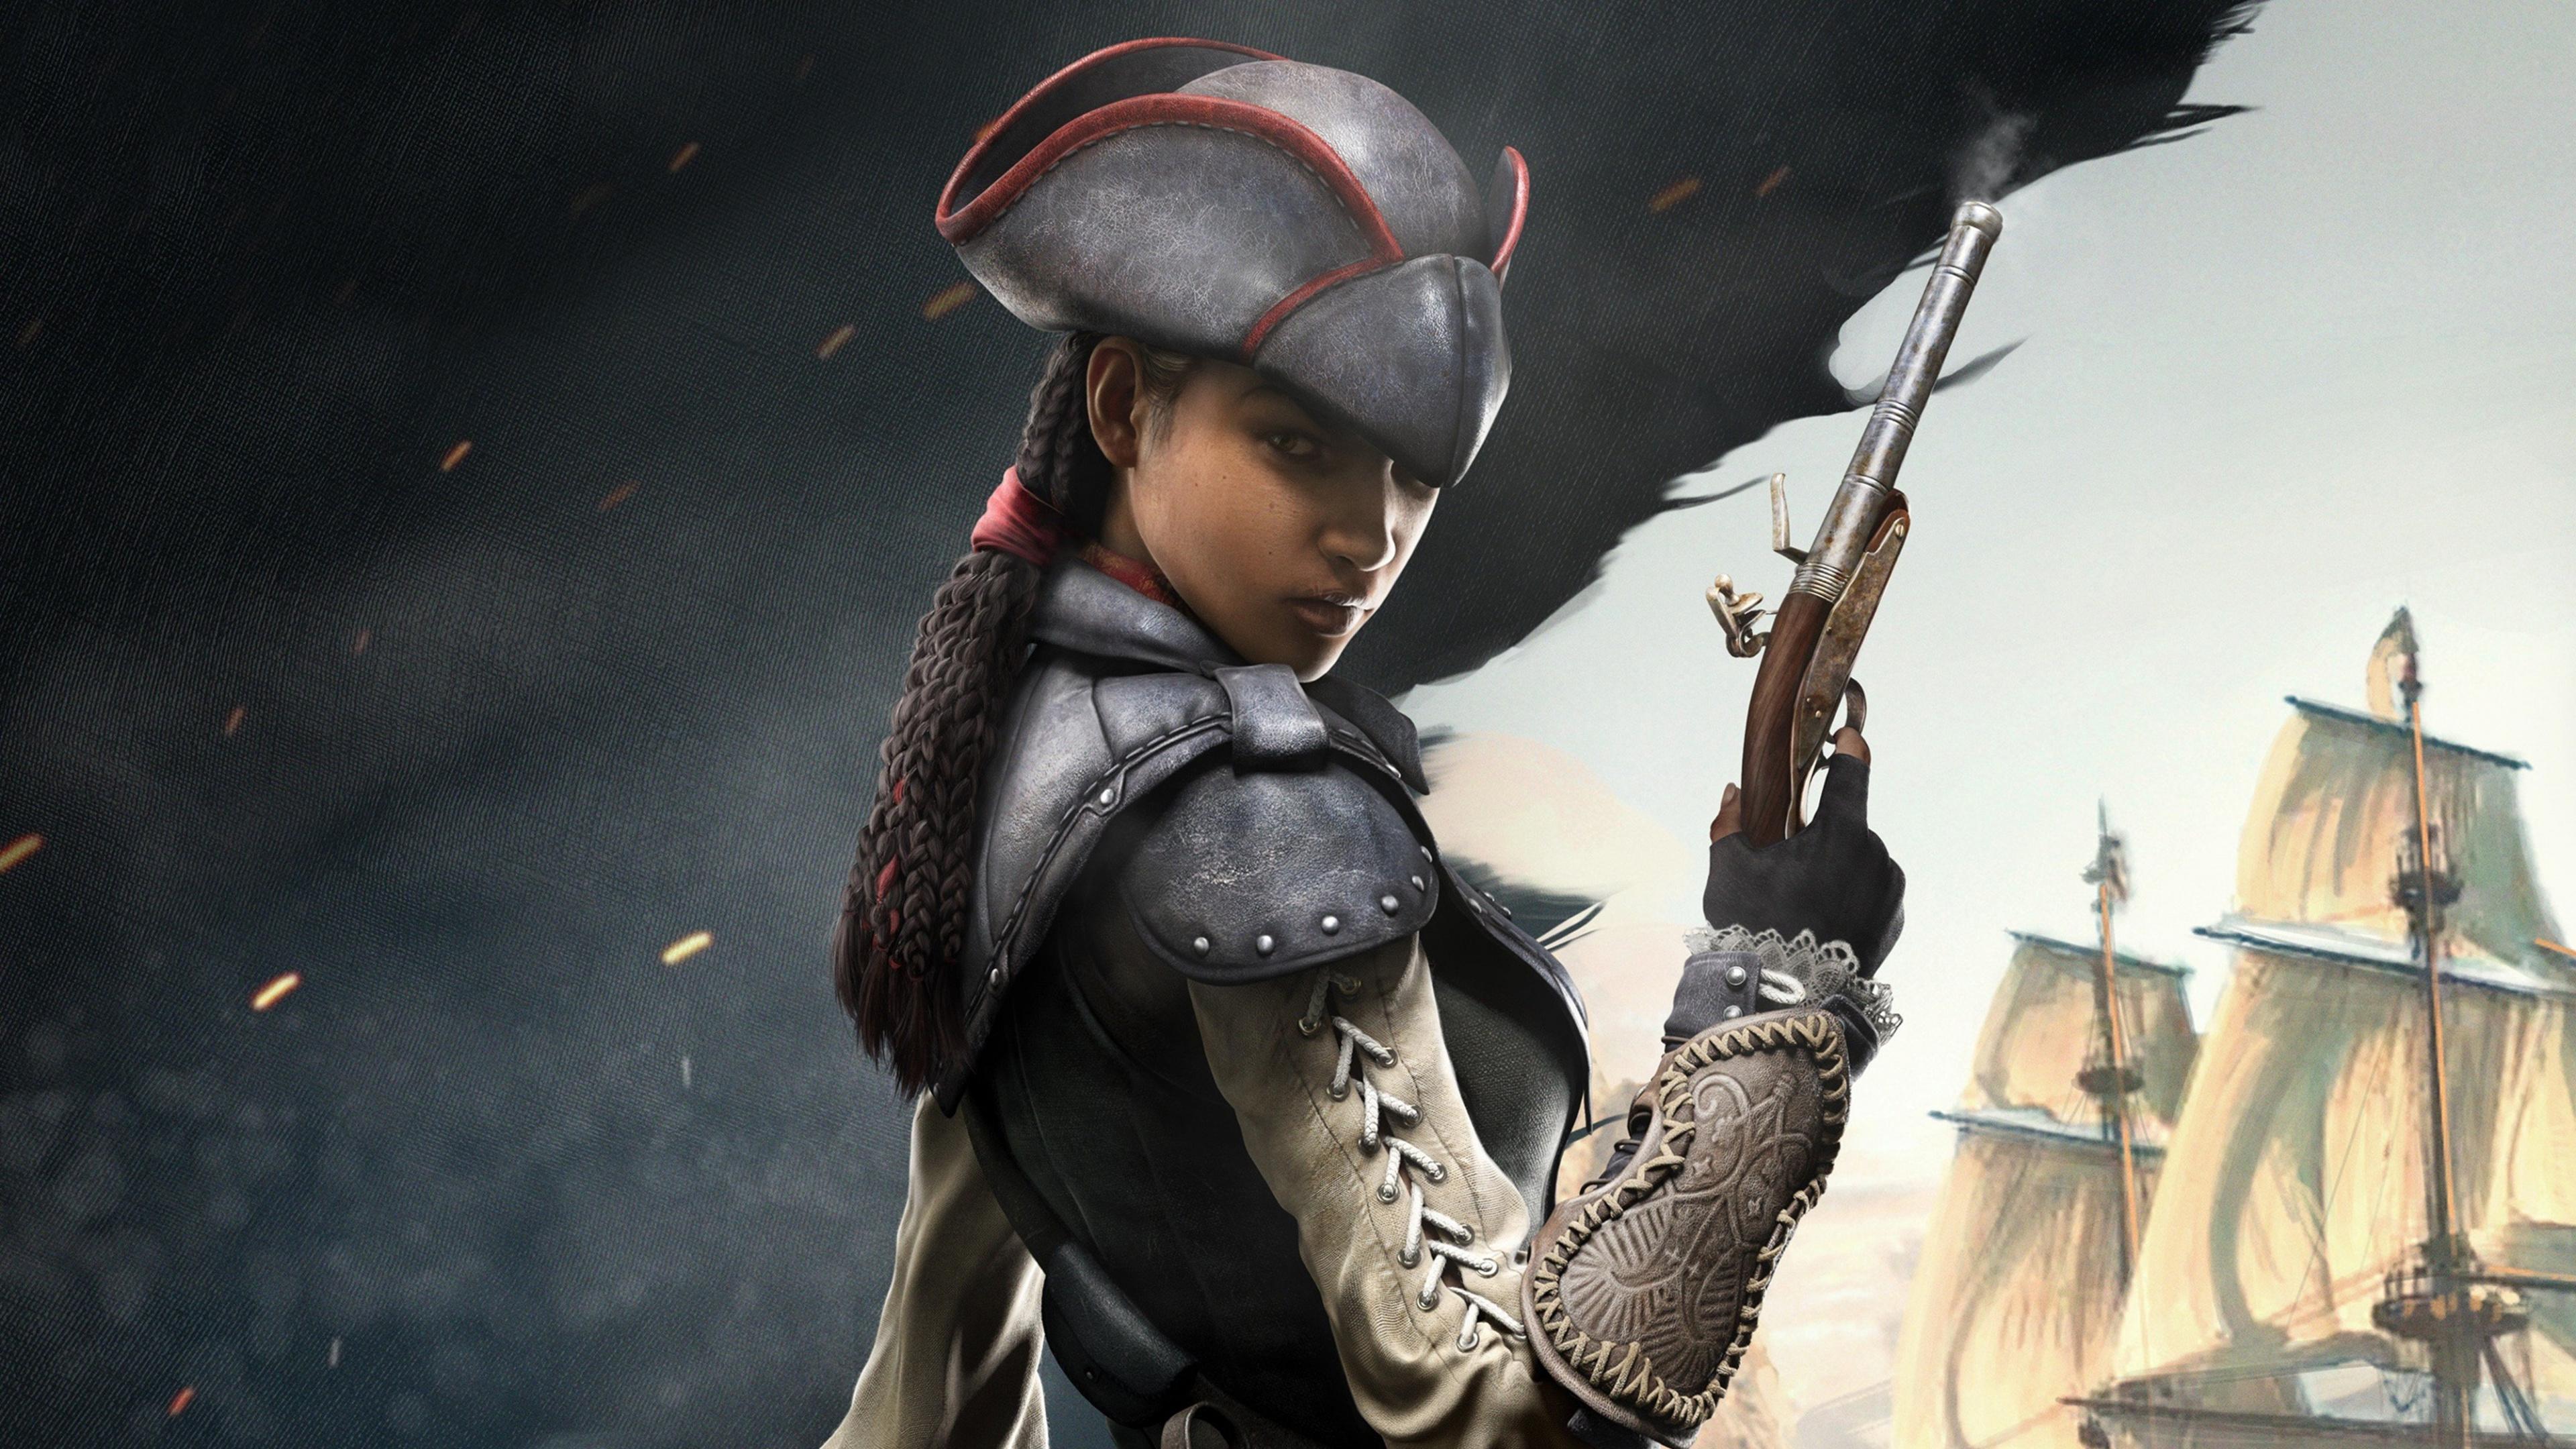 Black Assassins Creed Character 4k, HD Games, 4k ...